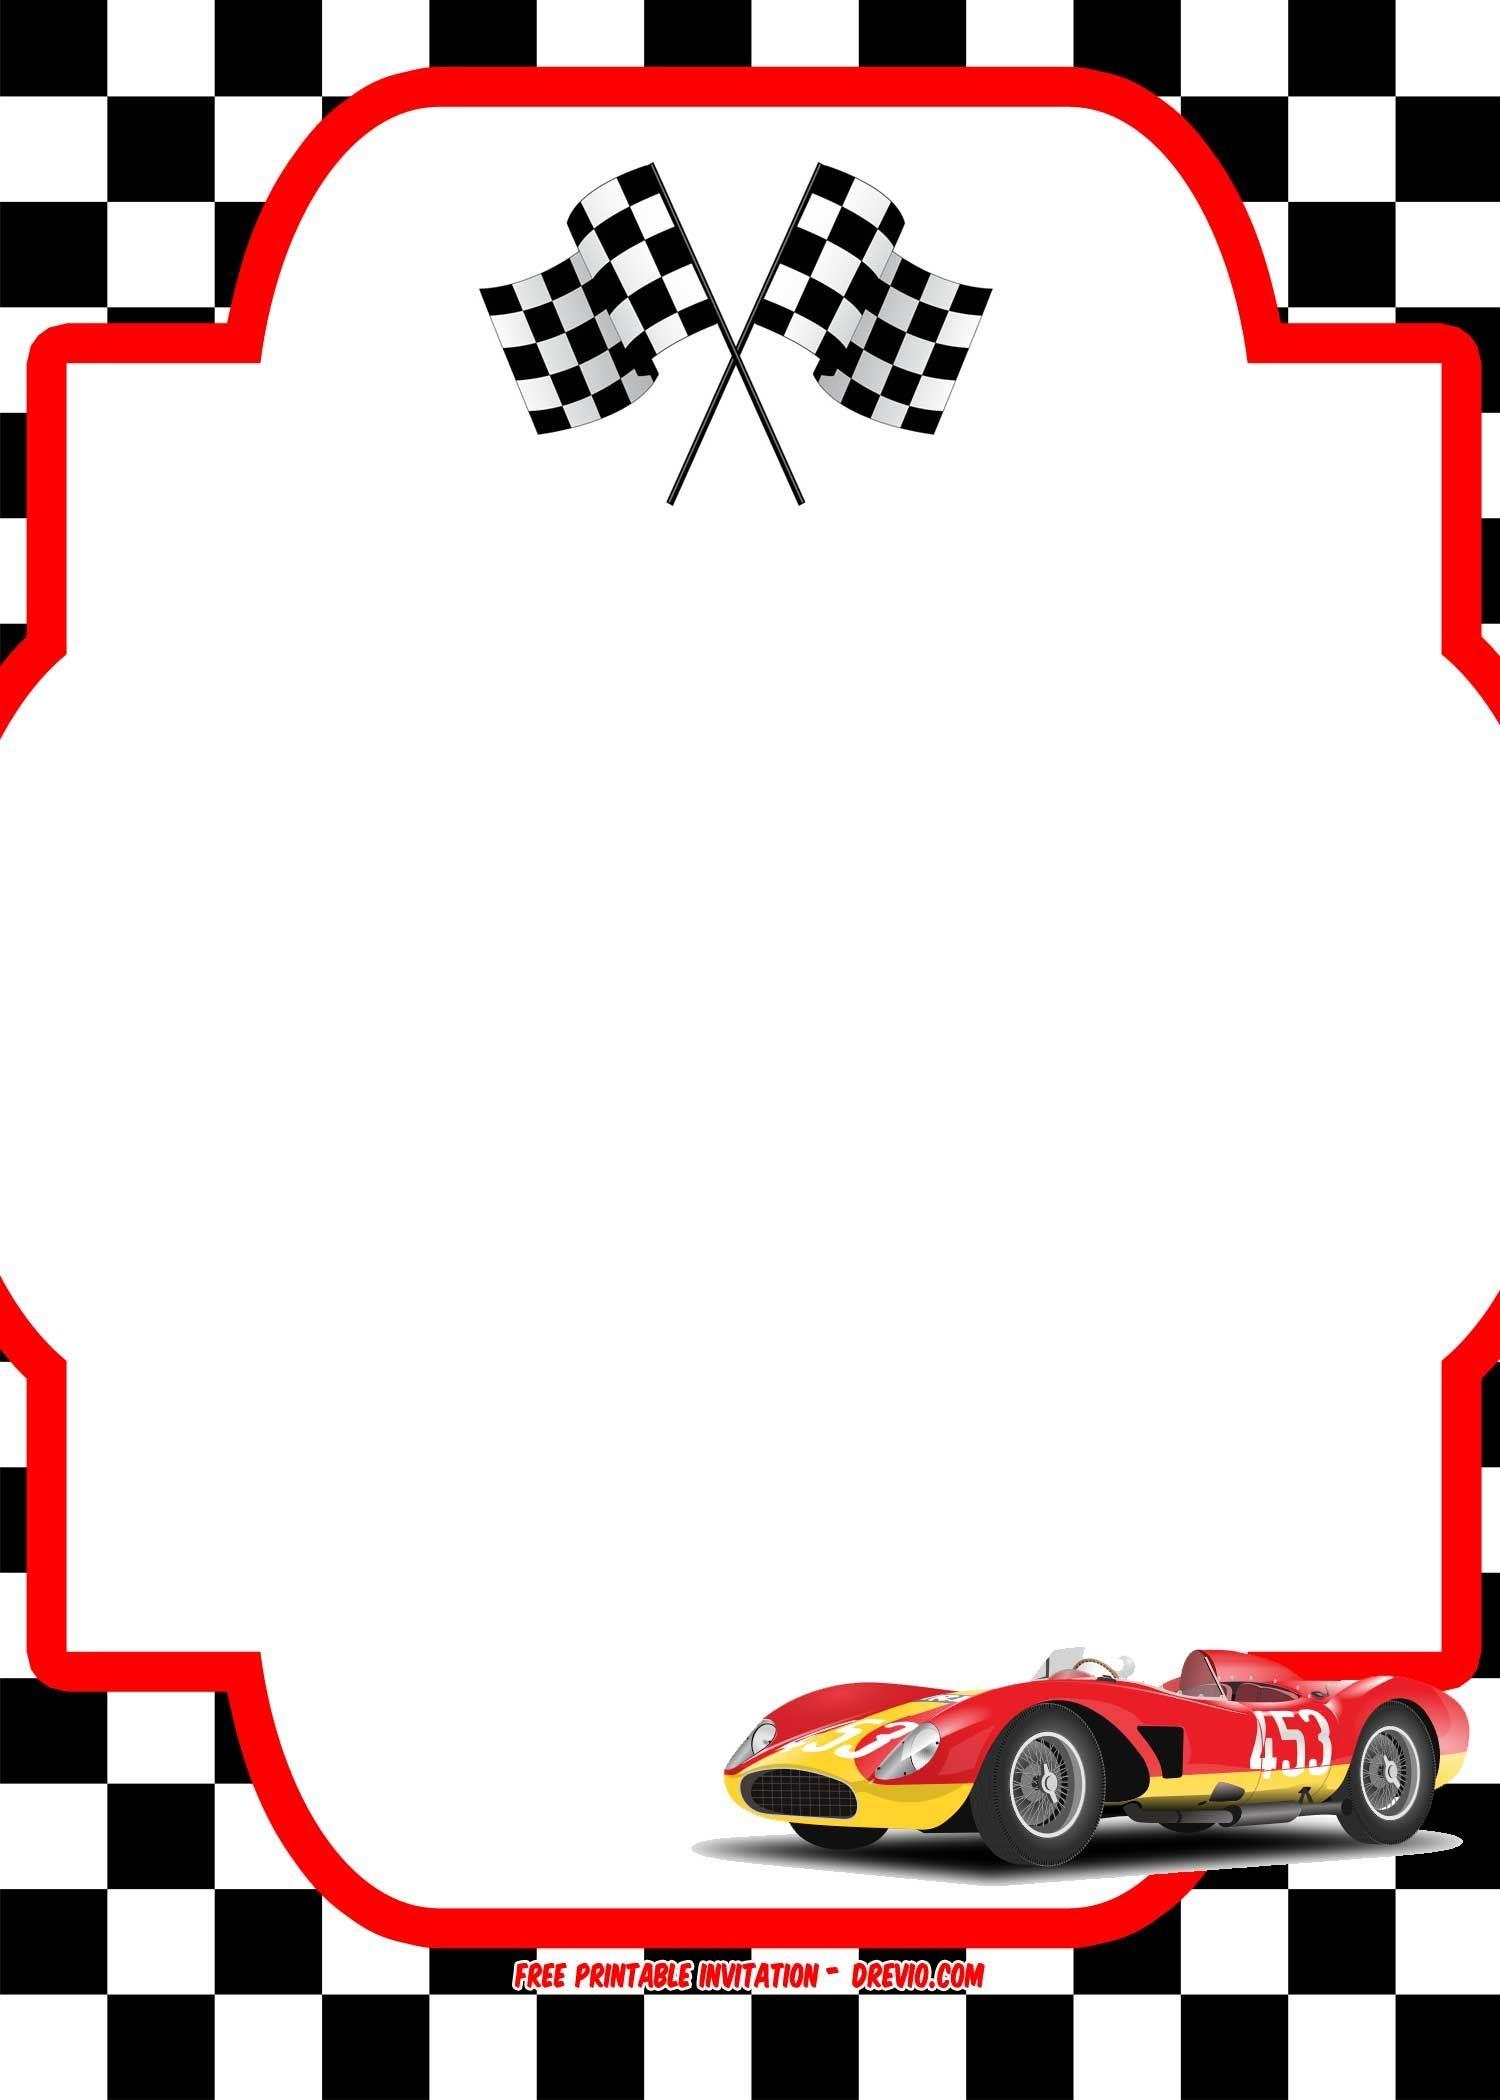 Free Race Car Birthday Invitation Template - Printable   Kids Party - Free Printable Birthday Invitations Cars Theme